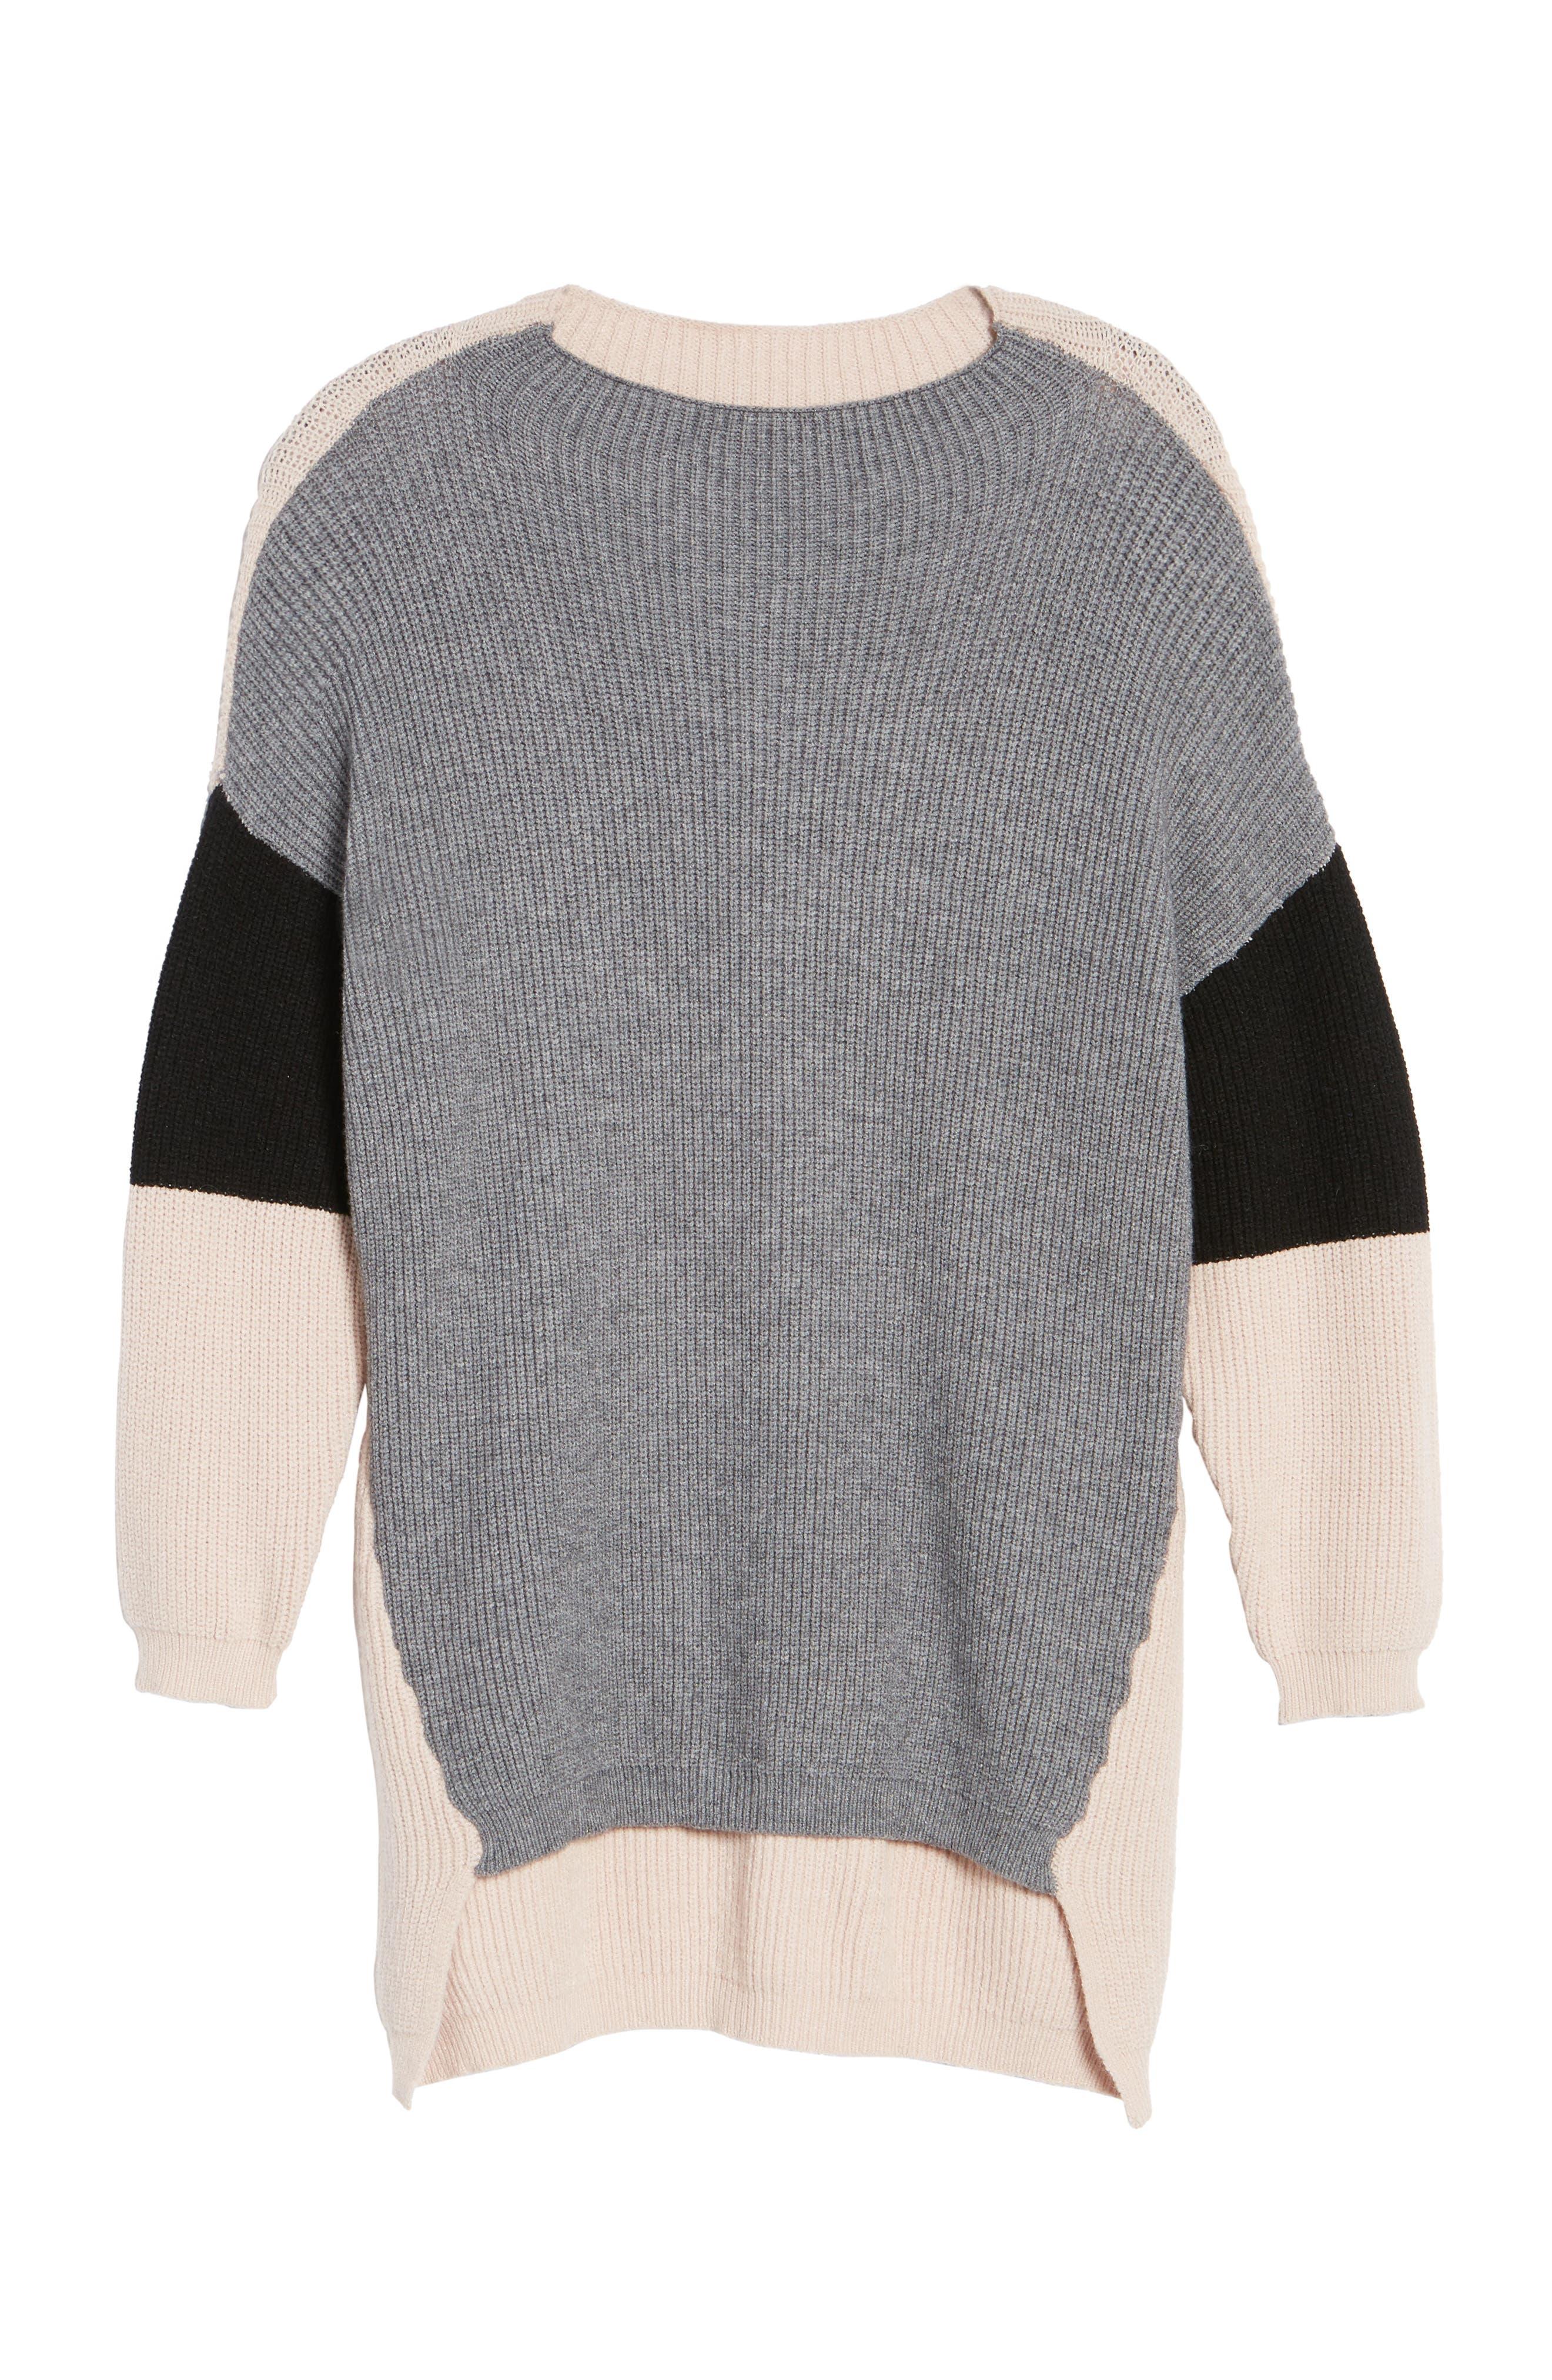 Colorblock Tunic Sweater,                             Alternate thumbnail 6, color,                             020